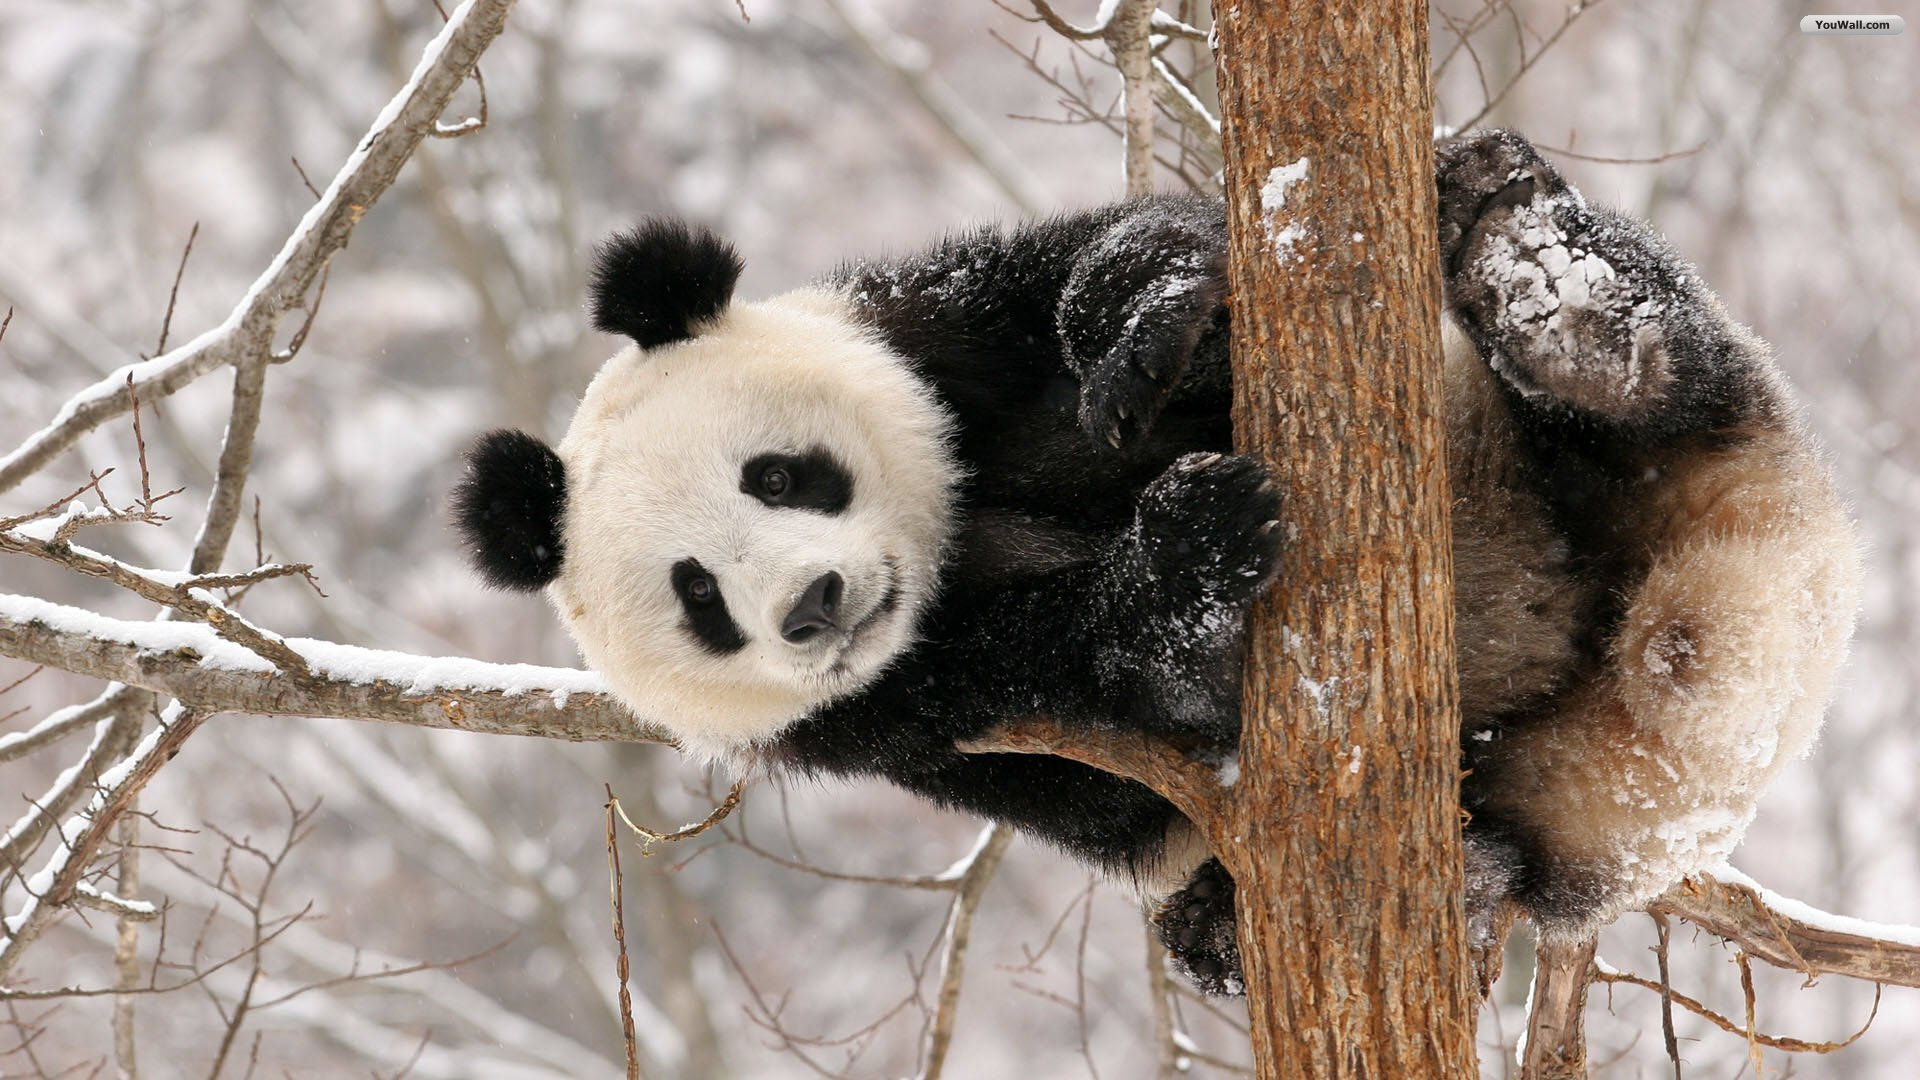 YouWall   Cute Panda Wallpaper   wallpaperwallpapersfree wallpaper 1920x1080